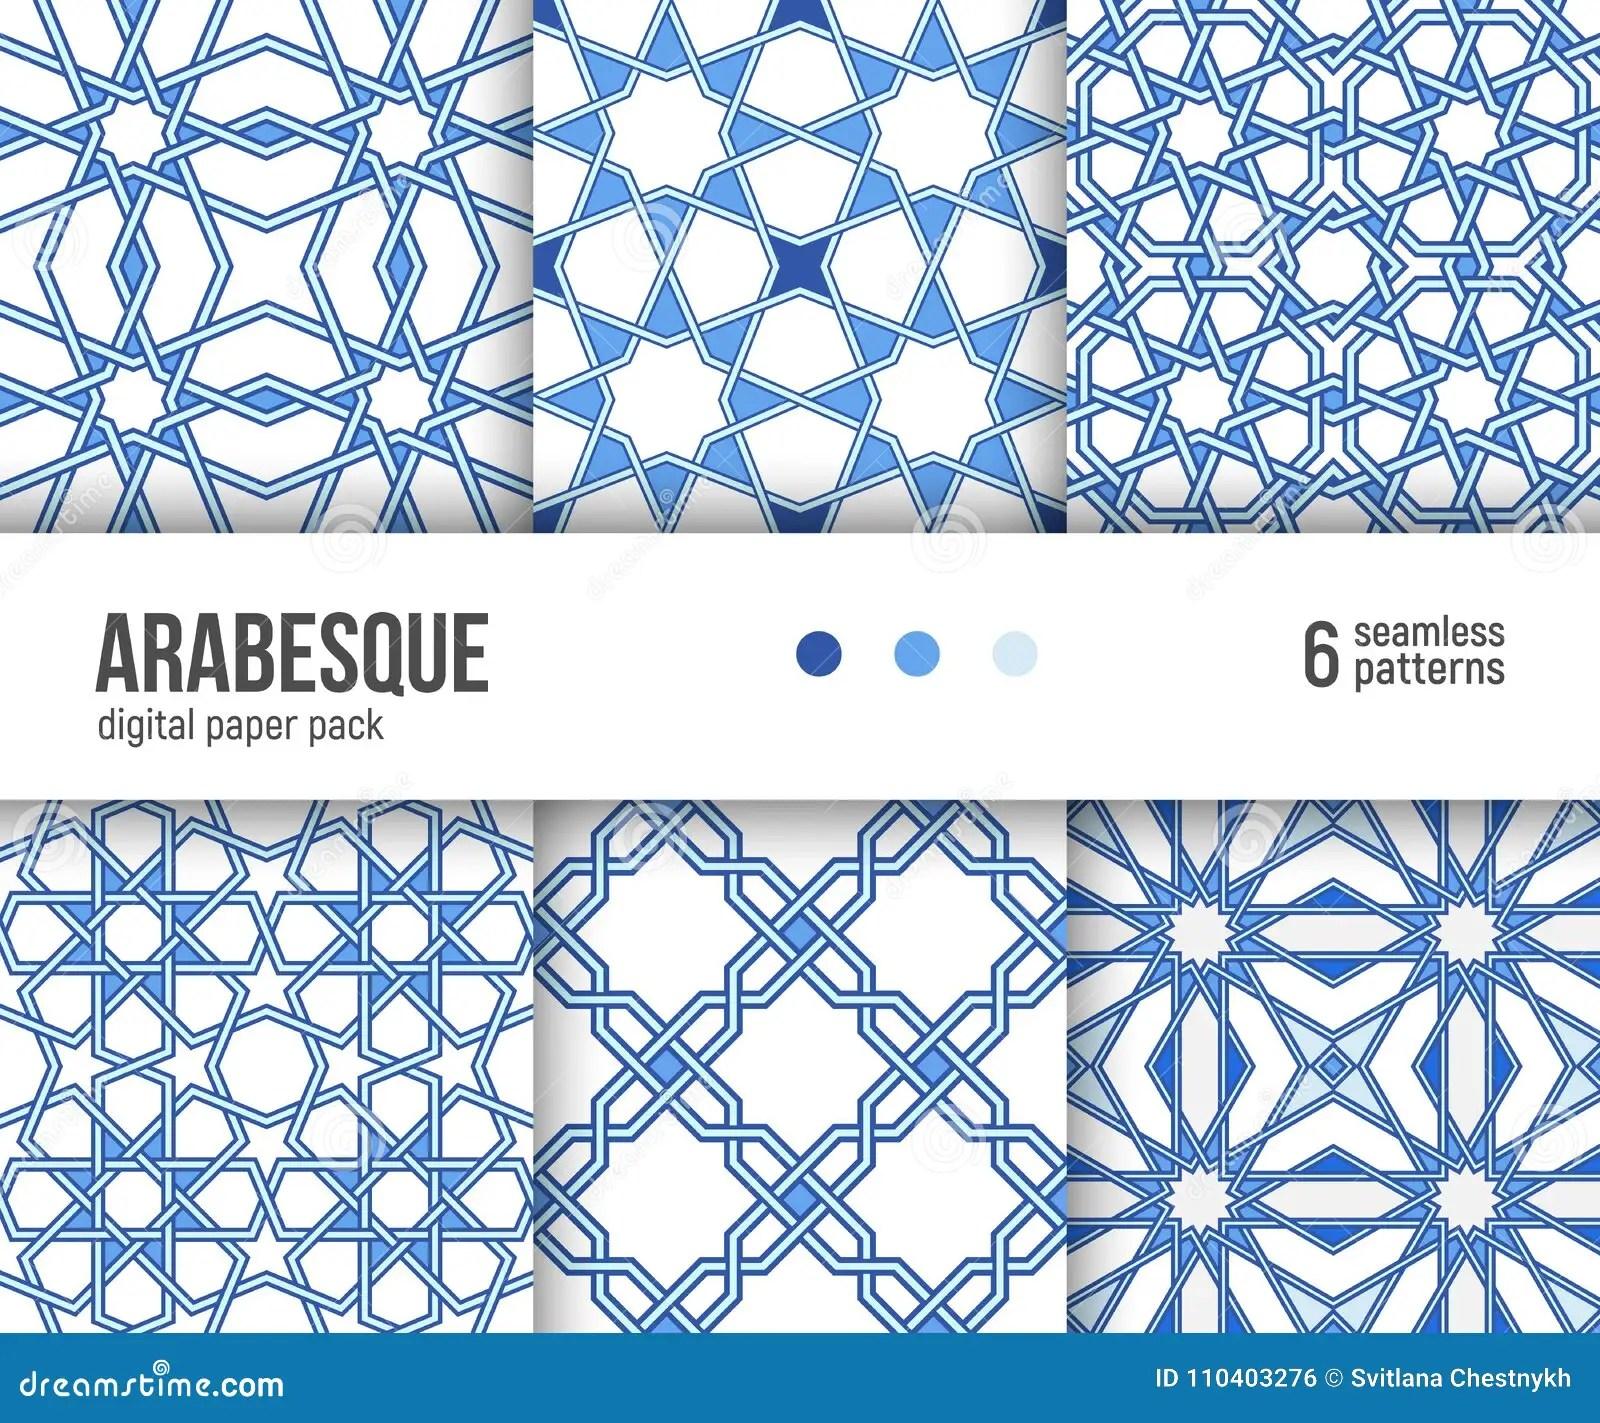 https www dreamstime com digital paper pack set abstract seamless patterns geometric backgrounds vector illustration portuguese floor tiles design image110403276